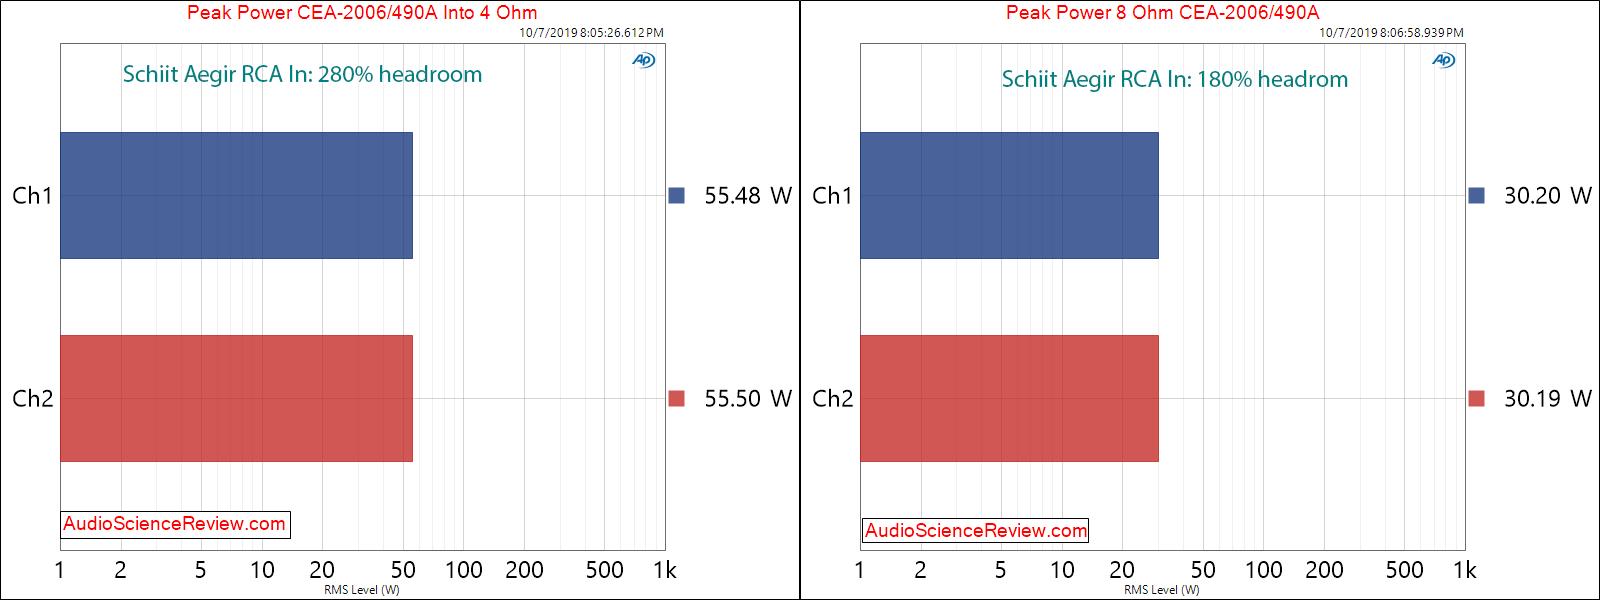 Schiit Aegir Stereo Power Amplifier Peak Power Audio Measurements.png